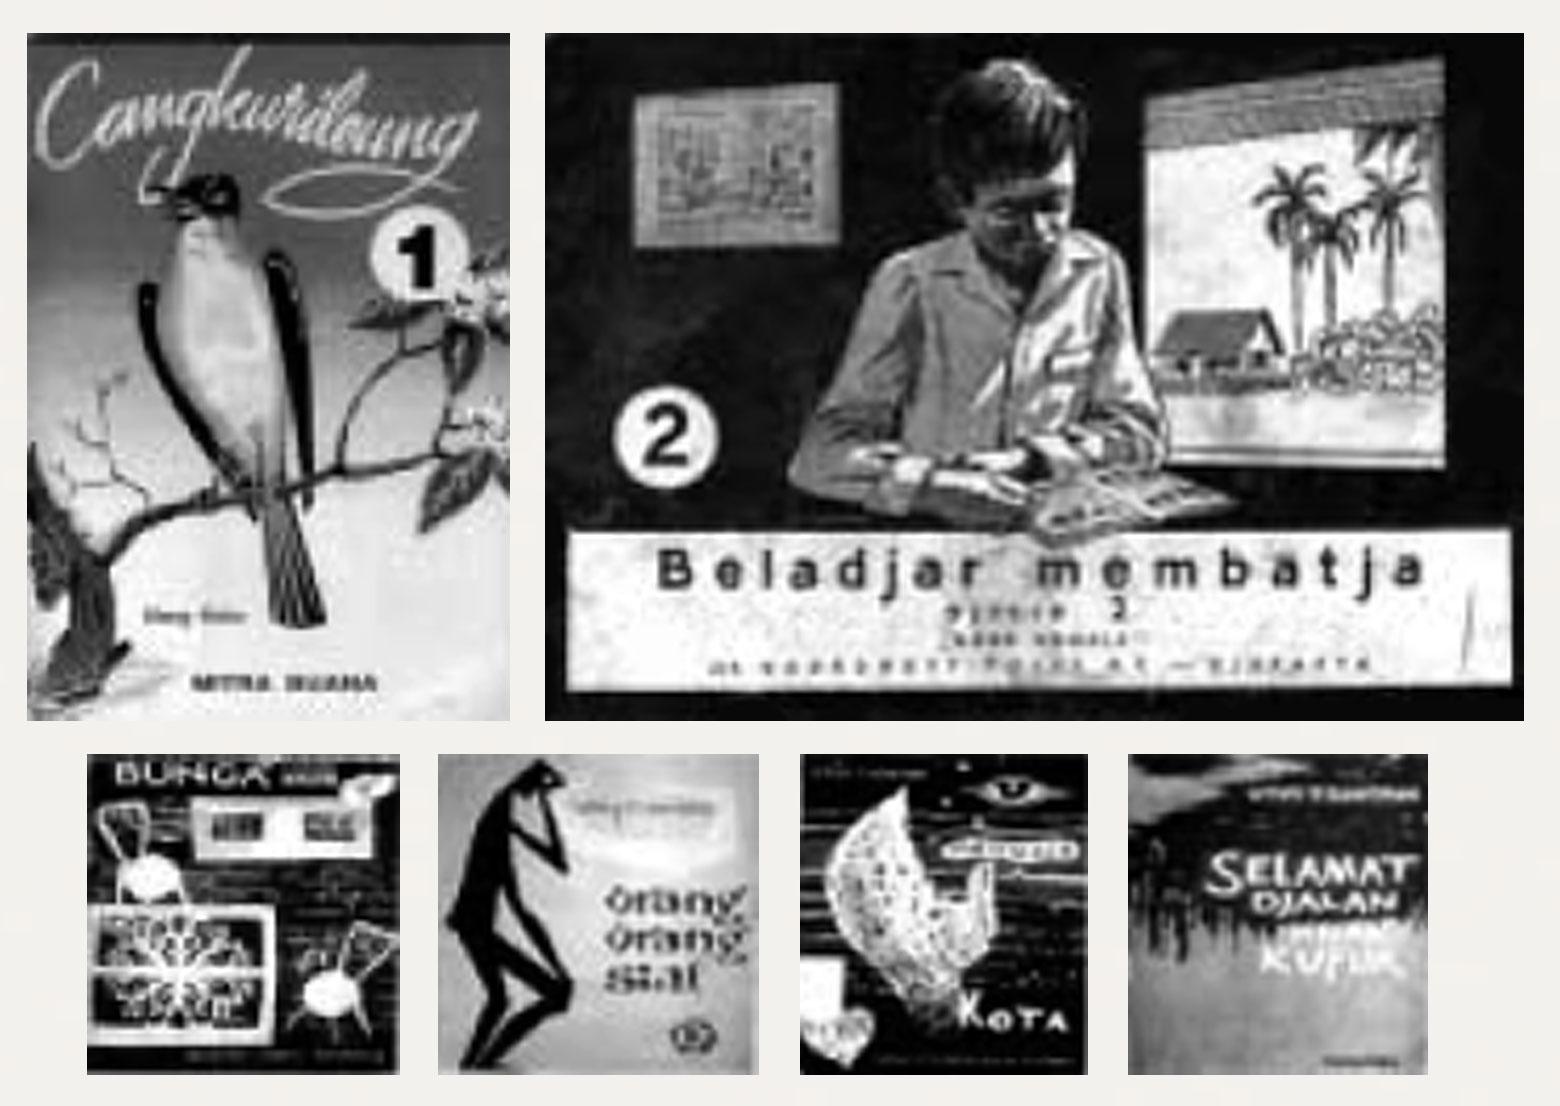 "Gambar 8. (a) Kulit muka buku ""Cangkurileung"" digambar oleh Nanang Durachman tahun 1960-an, dicetak ulang hingga lima kali; (b) Kulit muka buku ""Beladjar Membatja"" untuk siswa sekolah dasar dicetak tahun 1953; (c, d, e & f) Kulit muka sejumlah buku yang terbit tahun 1960 dengan ilustrasi bergaya ""Jengki""."